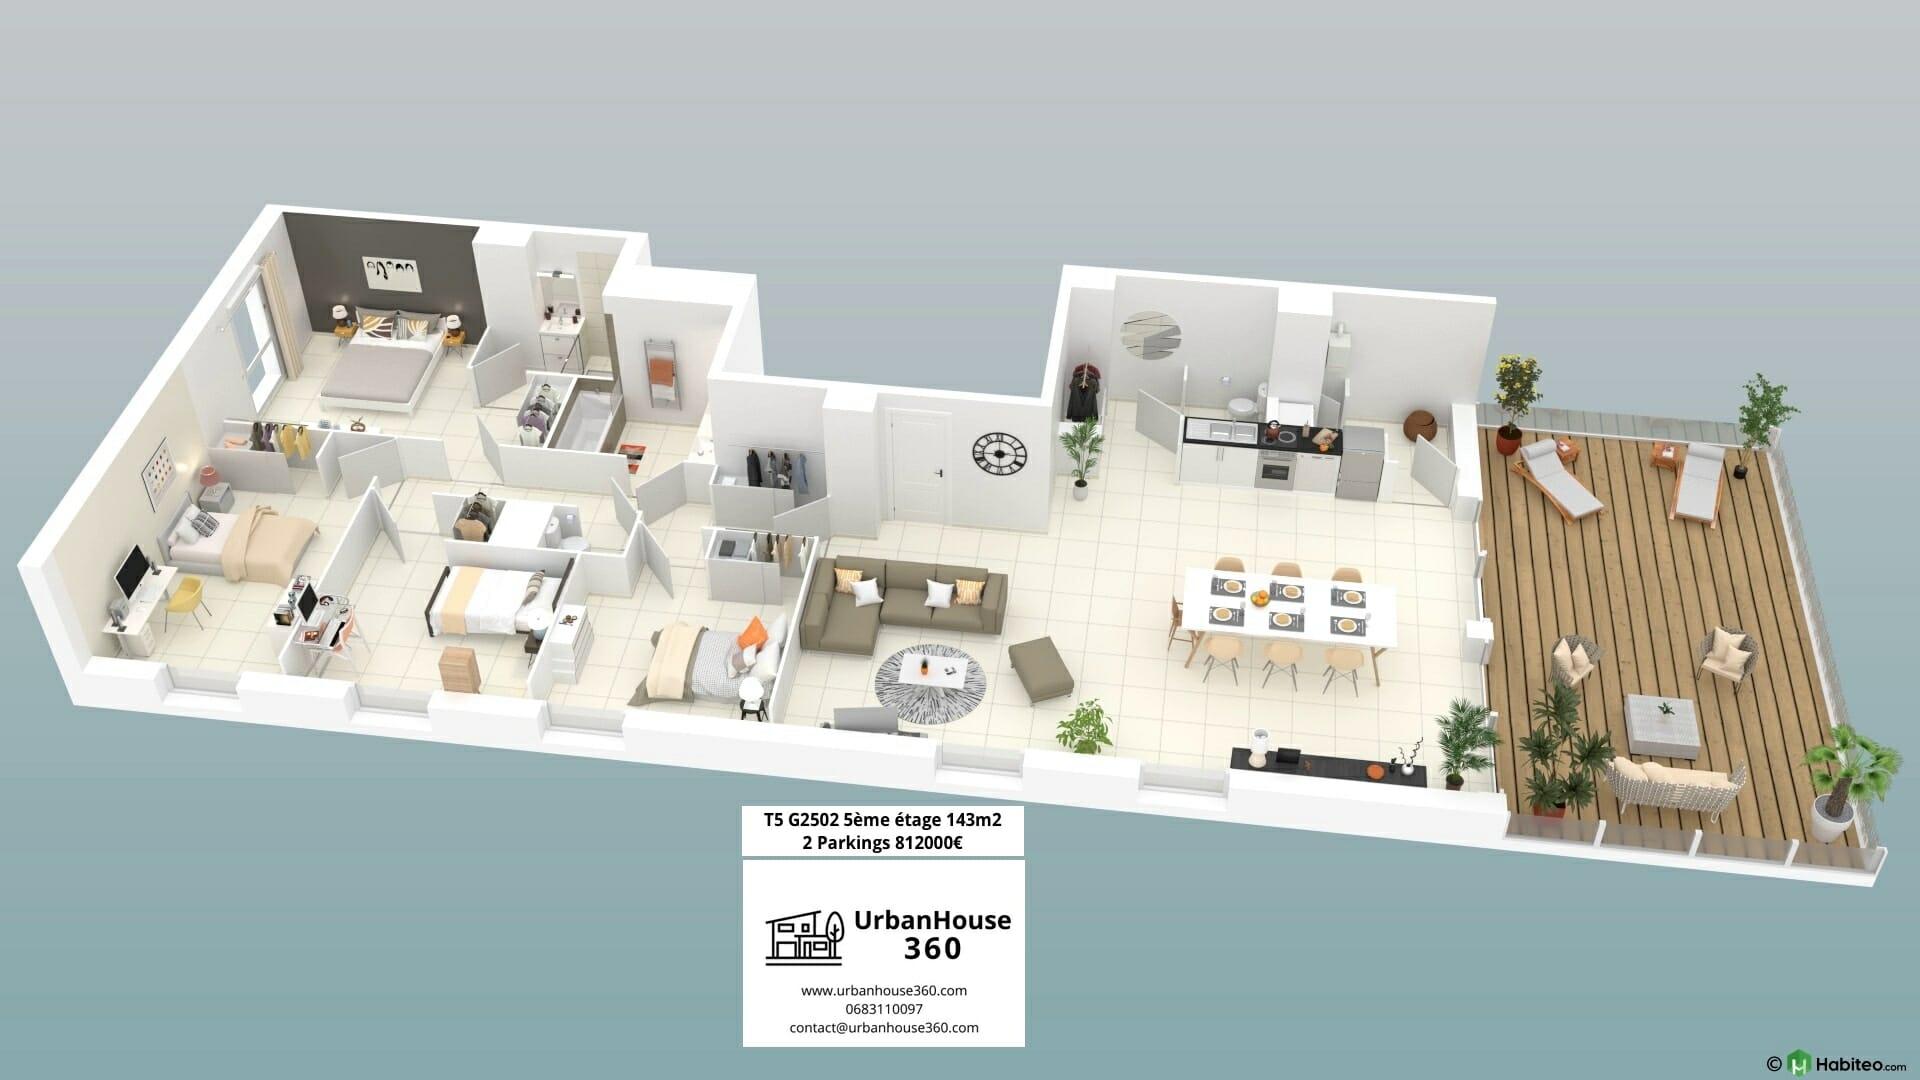 Urbanhouse360-Kaufman-Broad-Terre-Garonne_G2502_3D